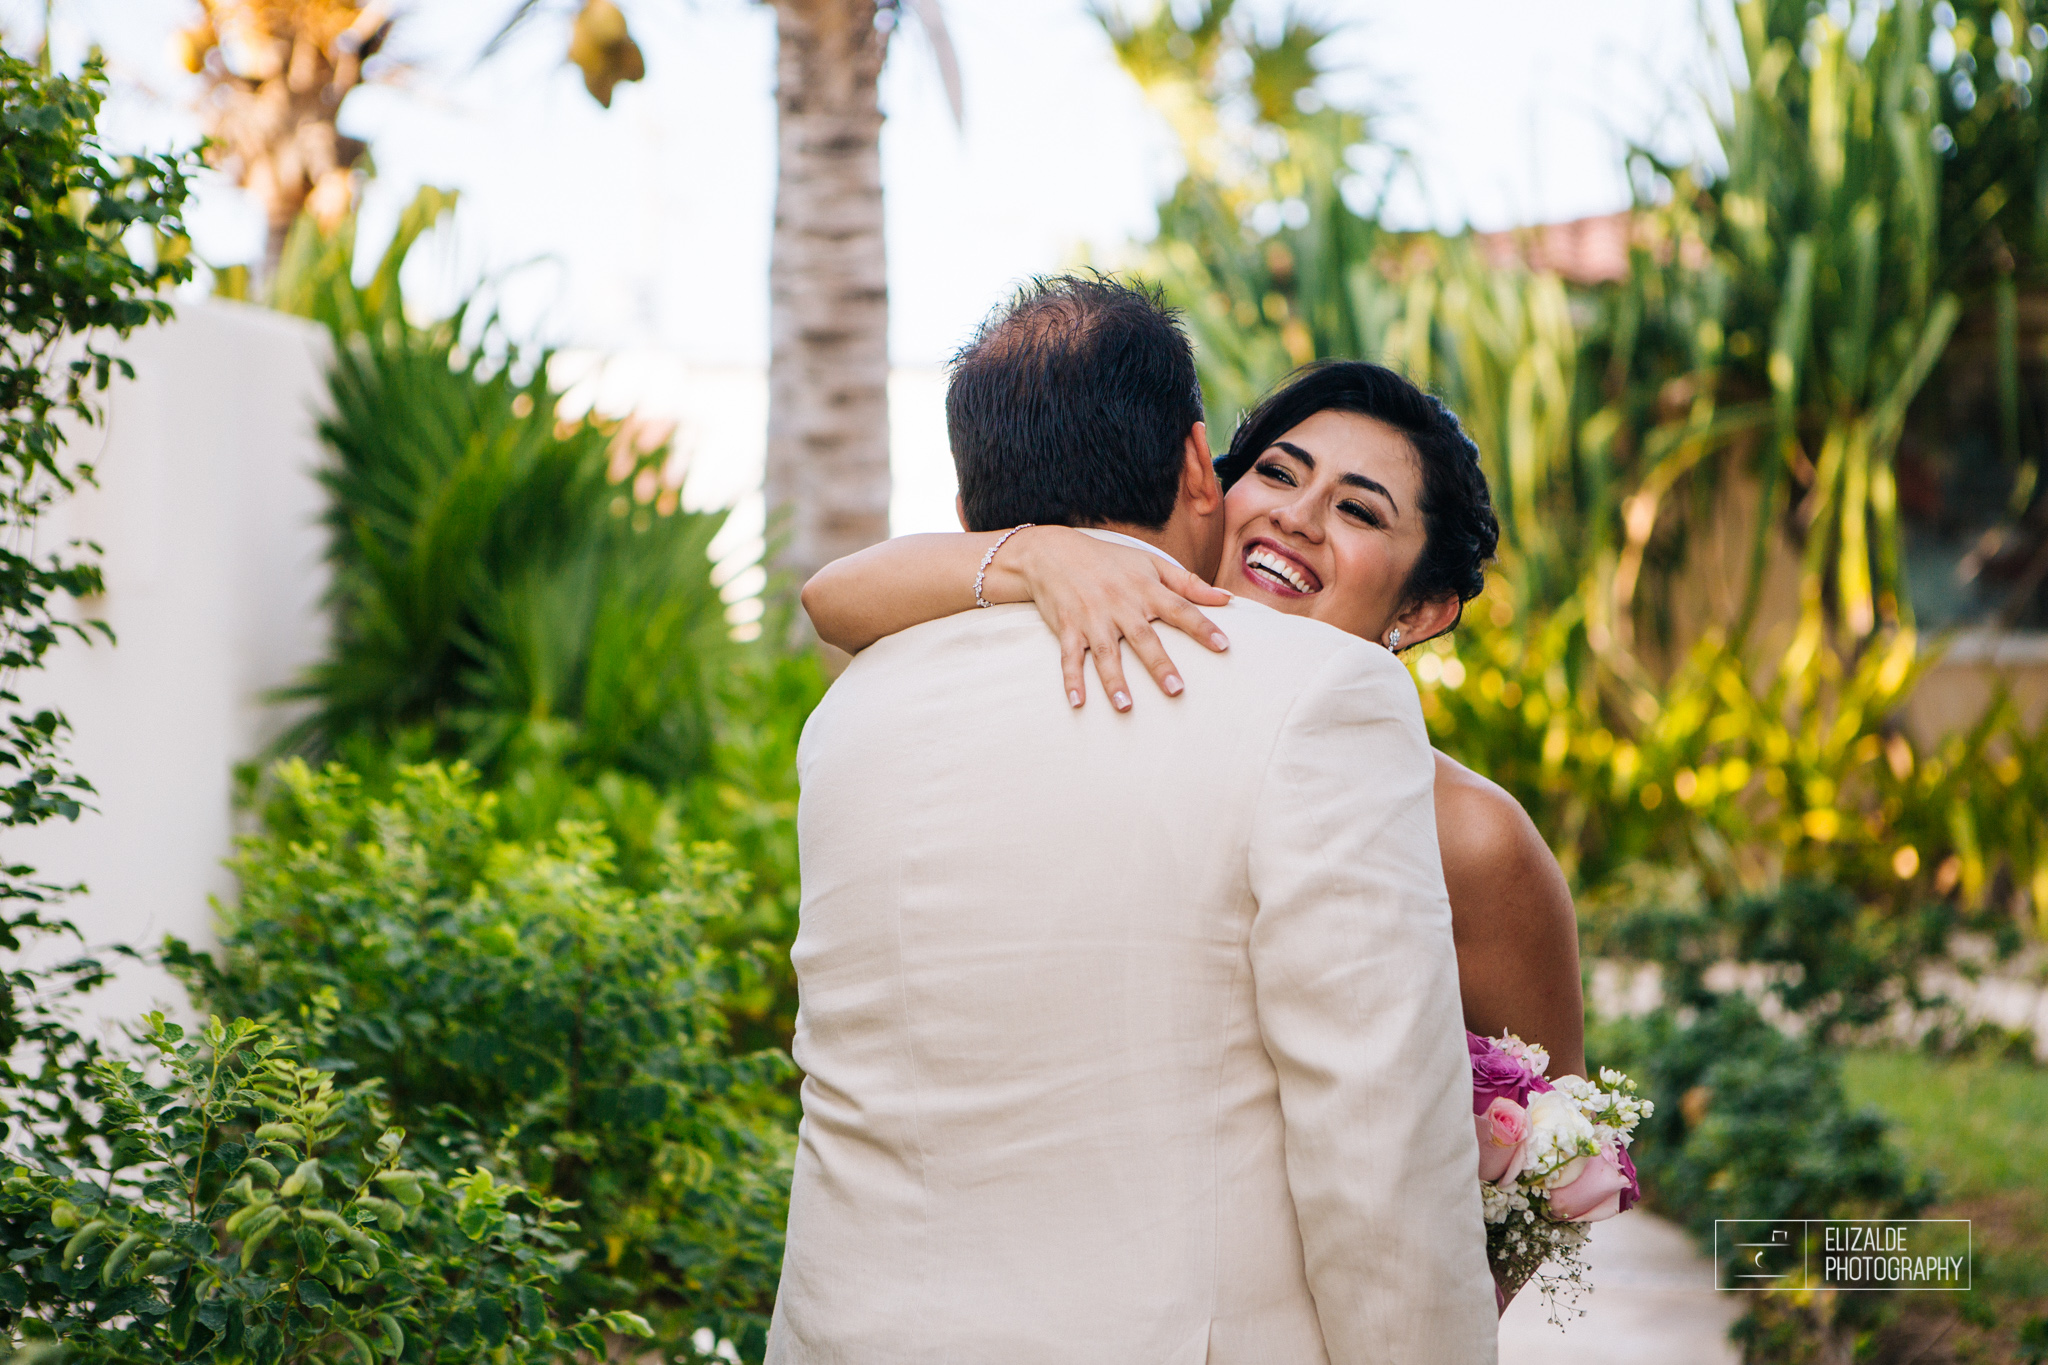 Pay and Ferran_Acapulco_Destination Wedding_Elizalde Photography-63.jpg